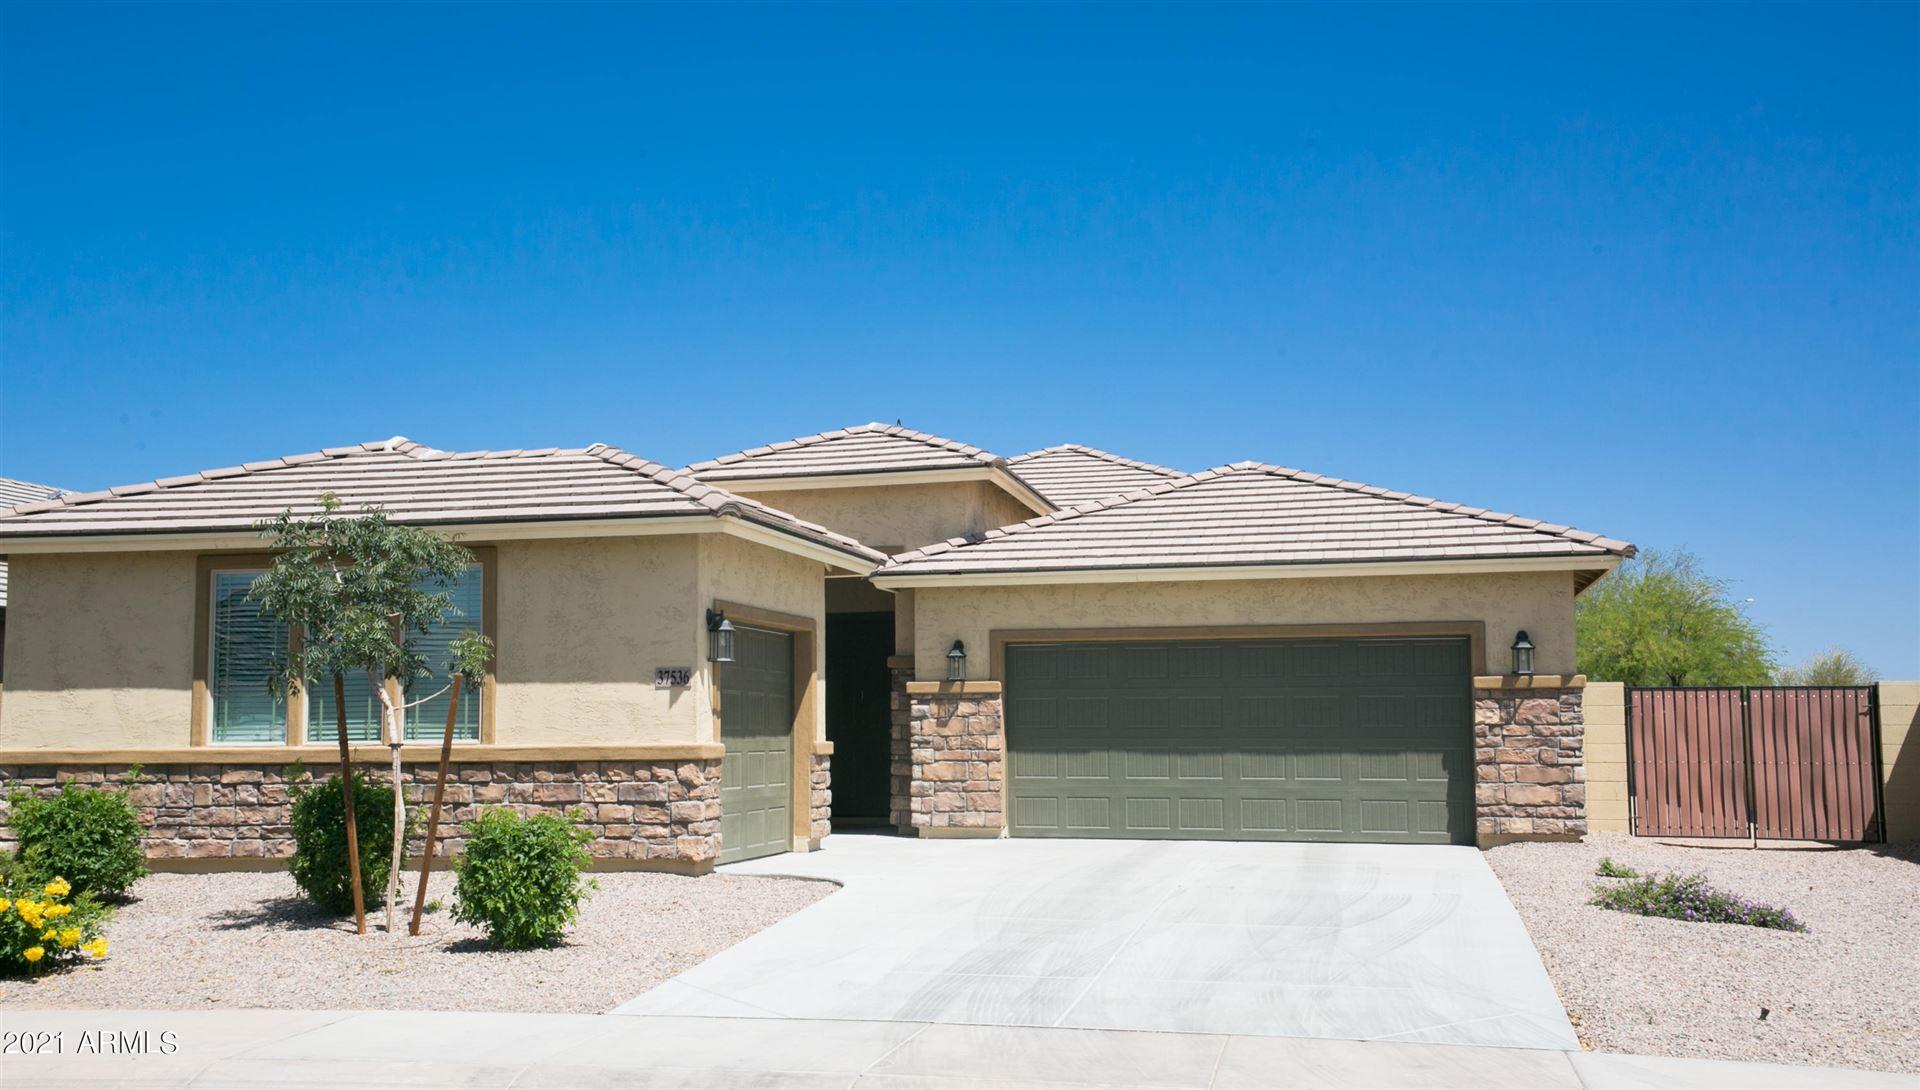 37536 W FRASCATI Avenue, Maricopa, AZ 85138 - MLS#: 6233587